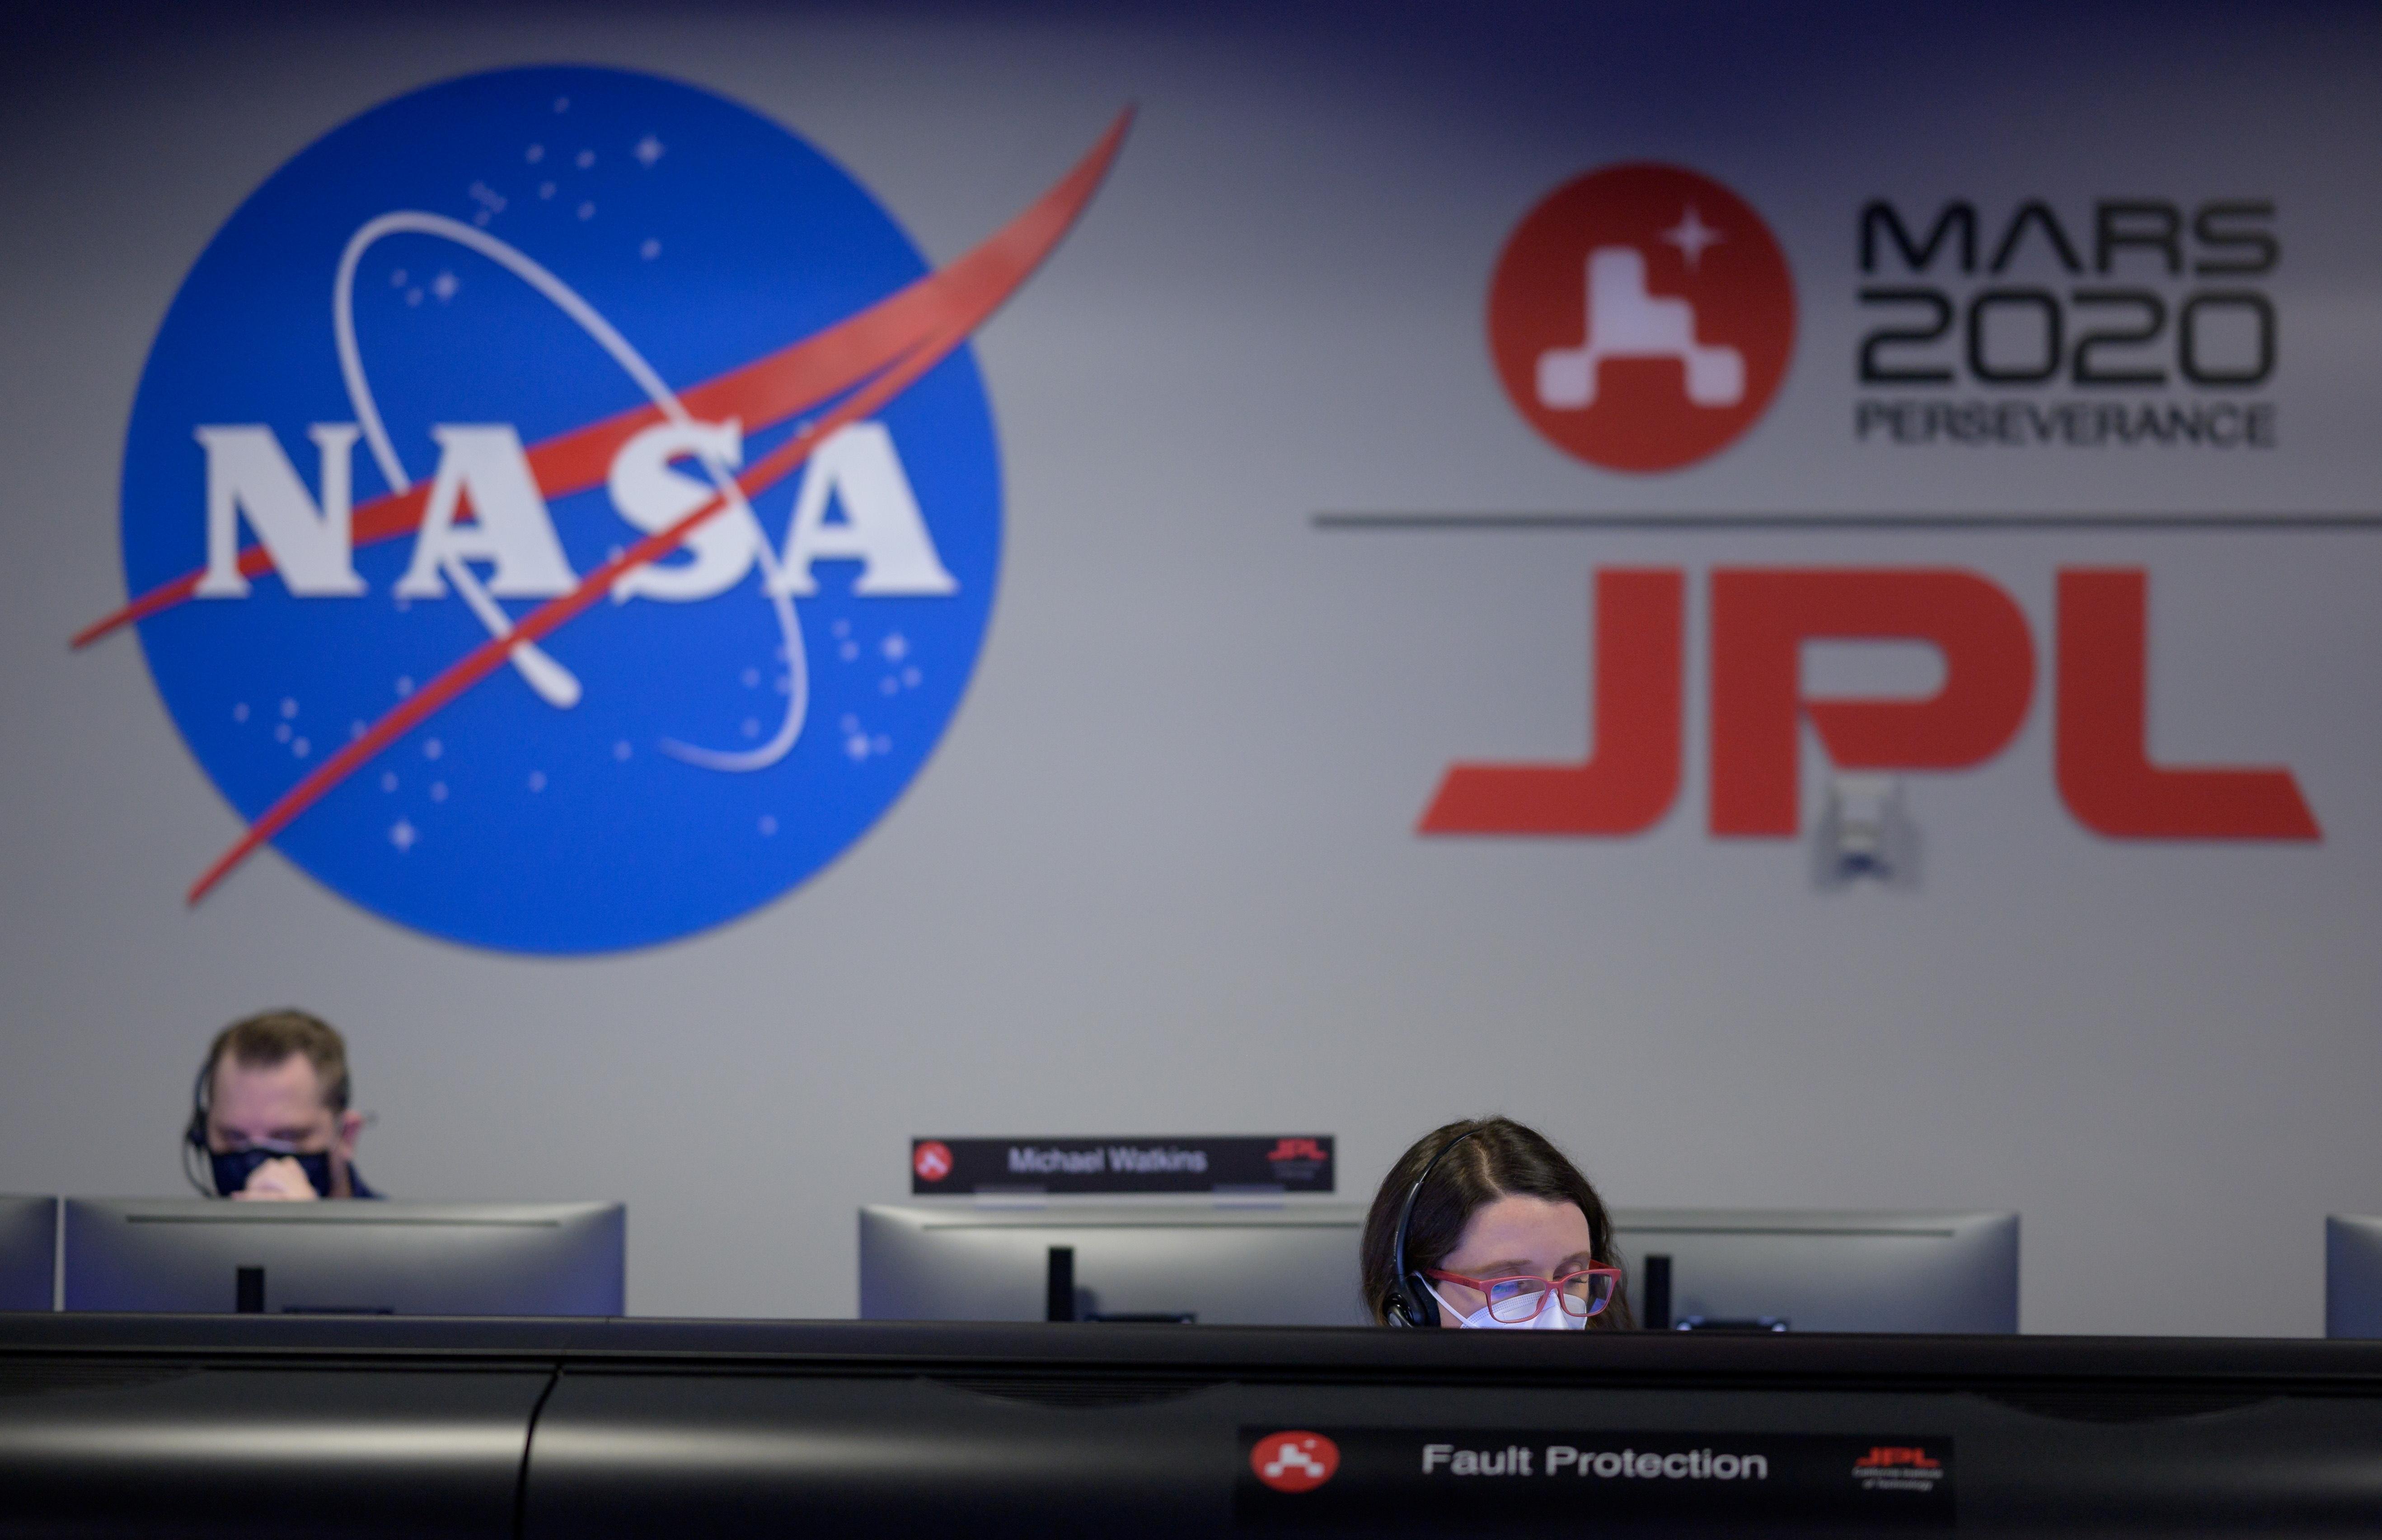 Members of NASA's Perseverance Mars rover team study data on monitors in mission control at NASA's Jet Propulsion Laboratory in Pasadena, California, U.S. February 18, 2021.    NASA/Bill Ingalls/Handout via REUTERS